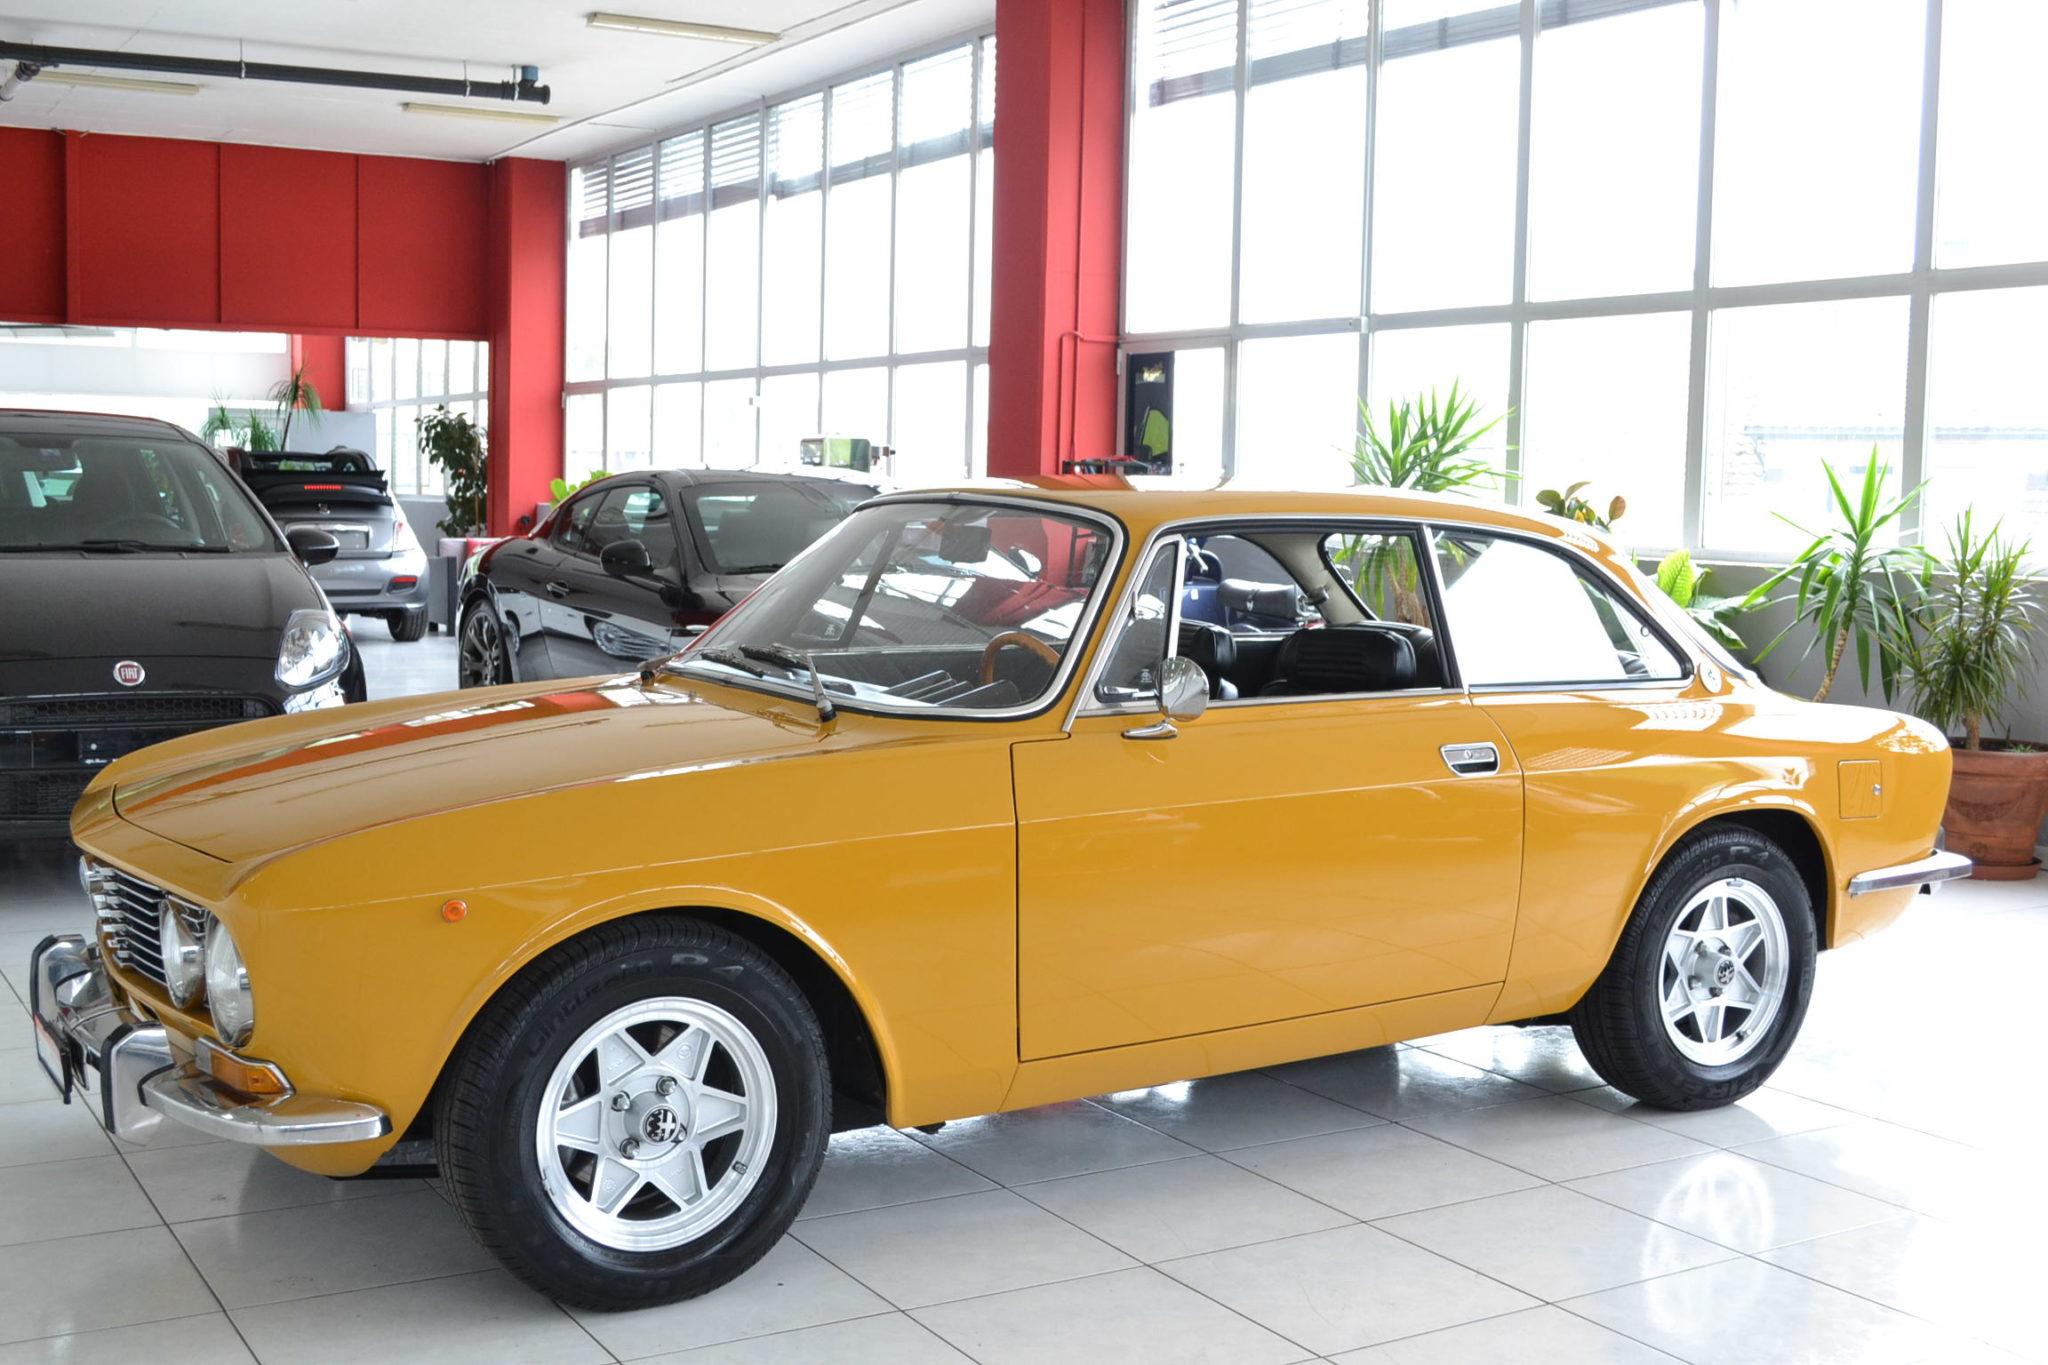 Alfa romeo gt 2000 giallo ocra garage vecchio for Garage alfa romeo 95